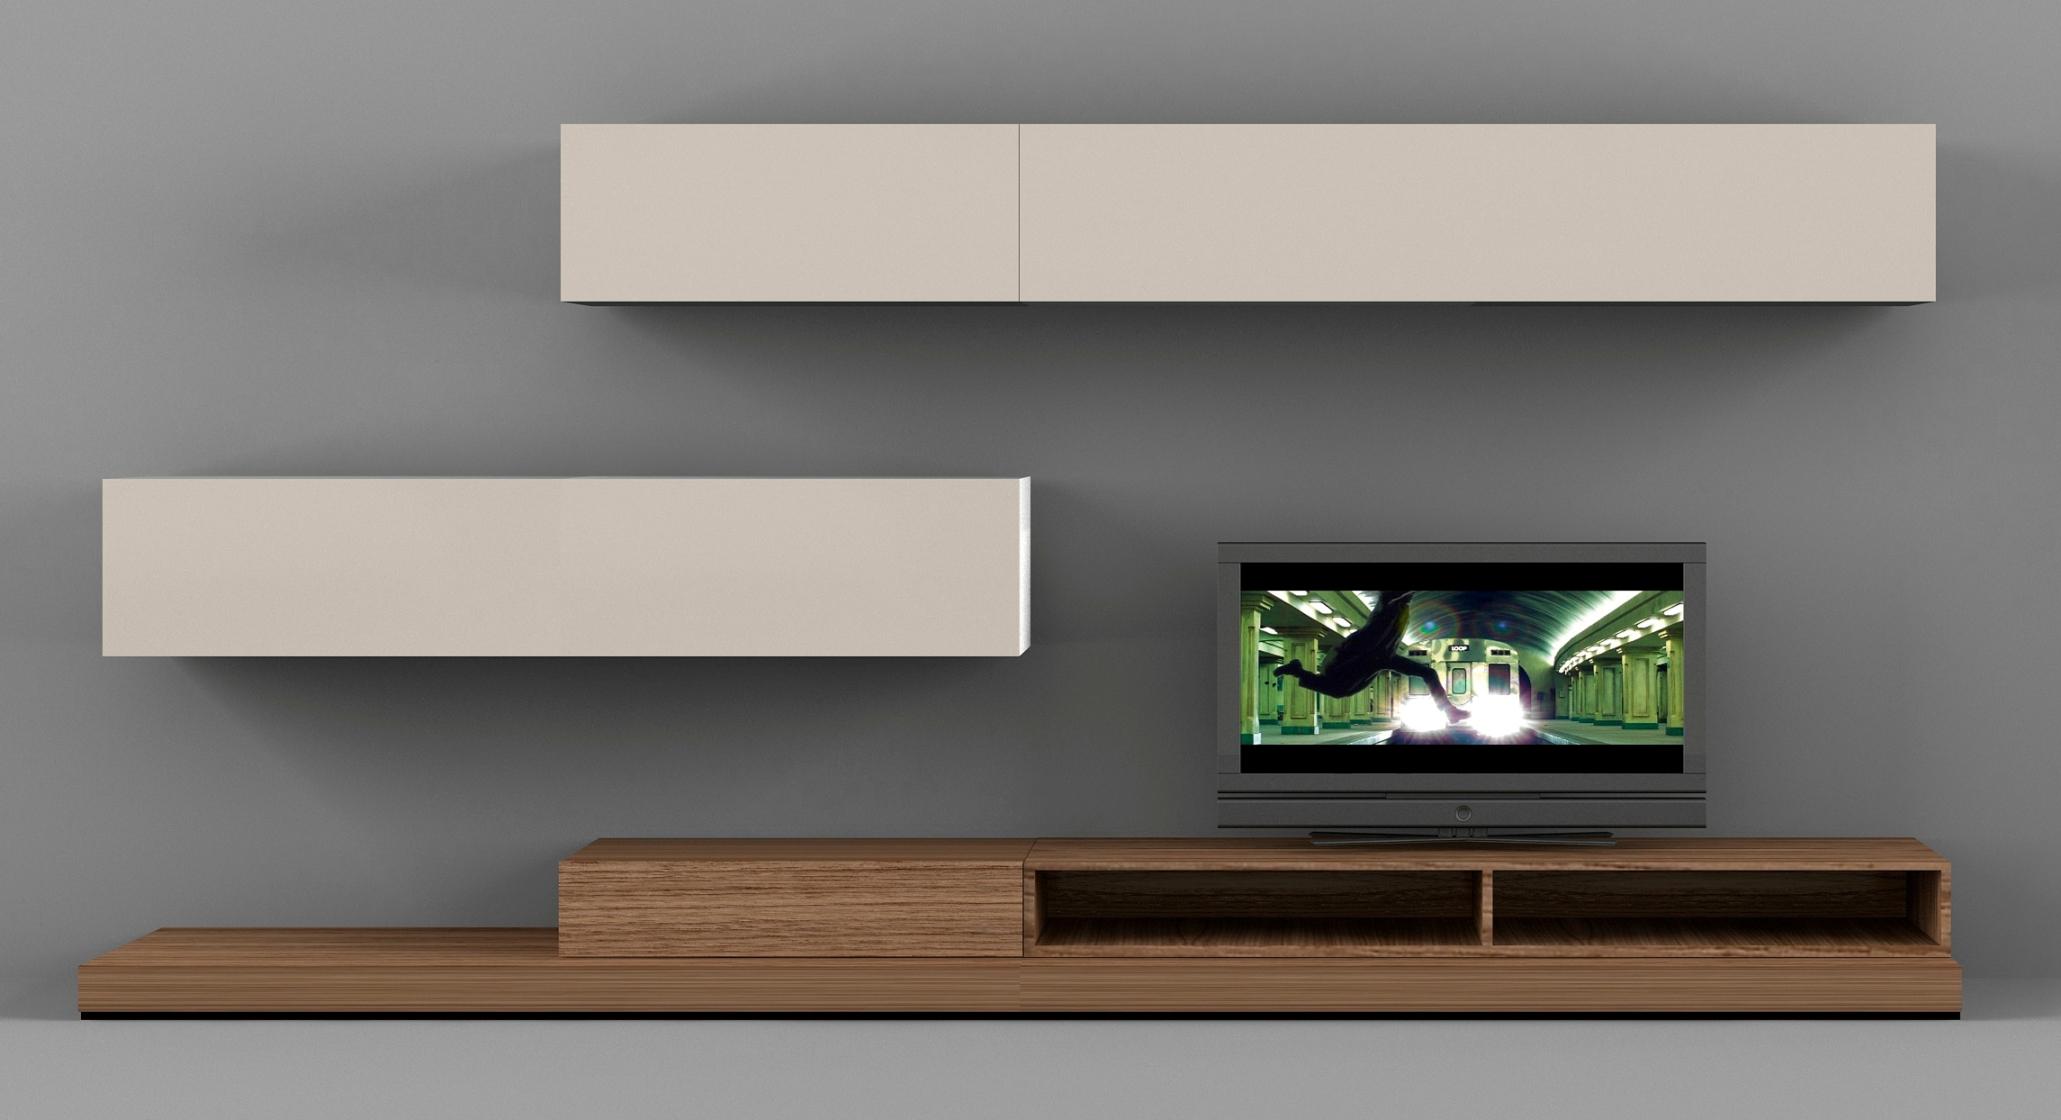 Интерьер в стиле минимализм с телевизором